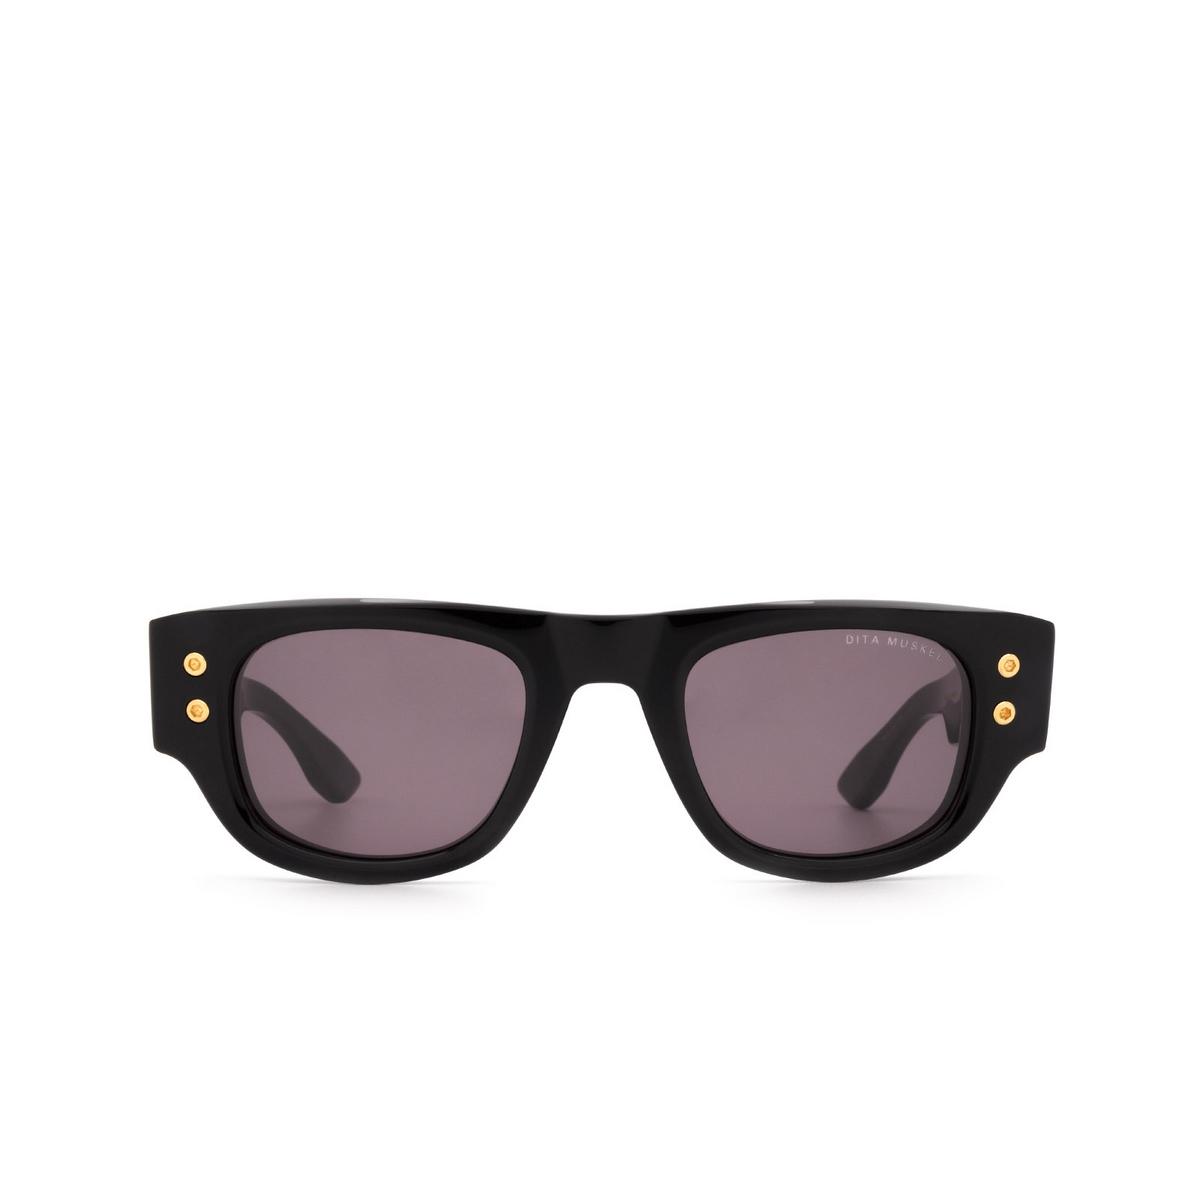 Dita® Rectangle Sunglasses: Muskel DTS701-A-01-Z color Black & Gold Blk-gld.